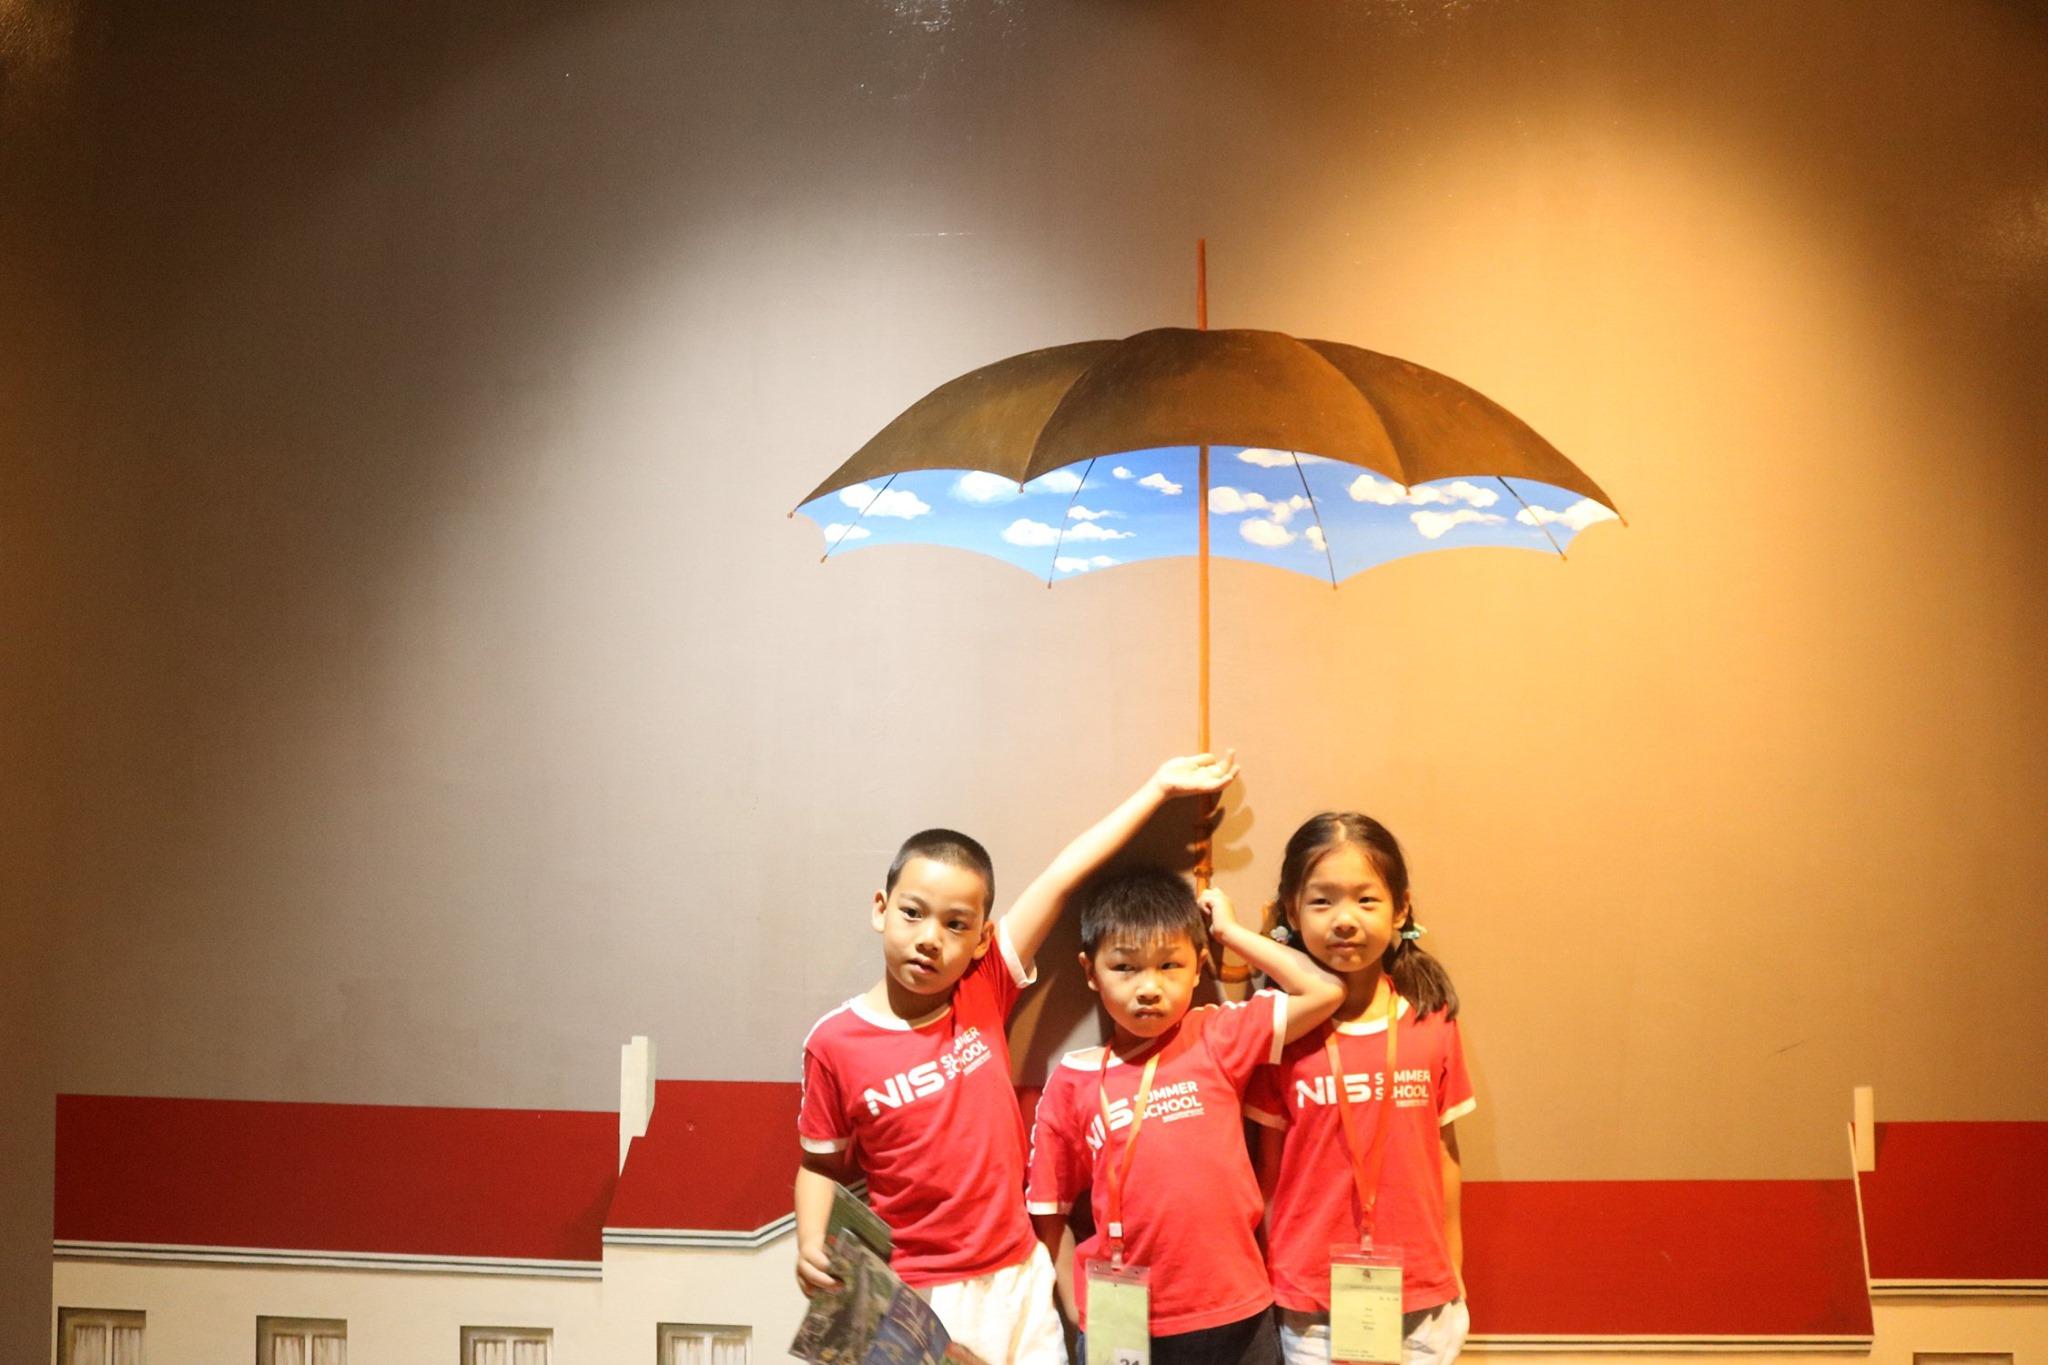 NIS-Summer-School-2019-Day-24-Kiddy-Land-9